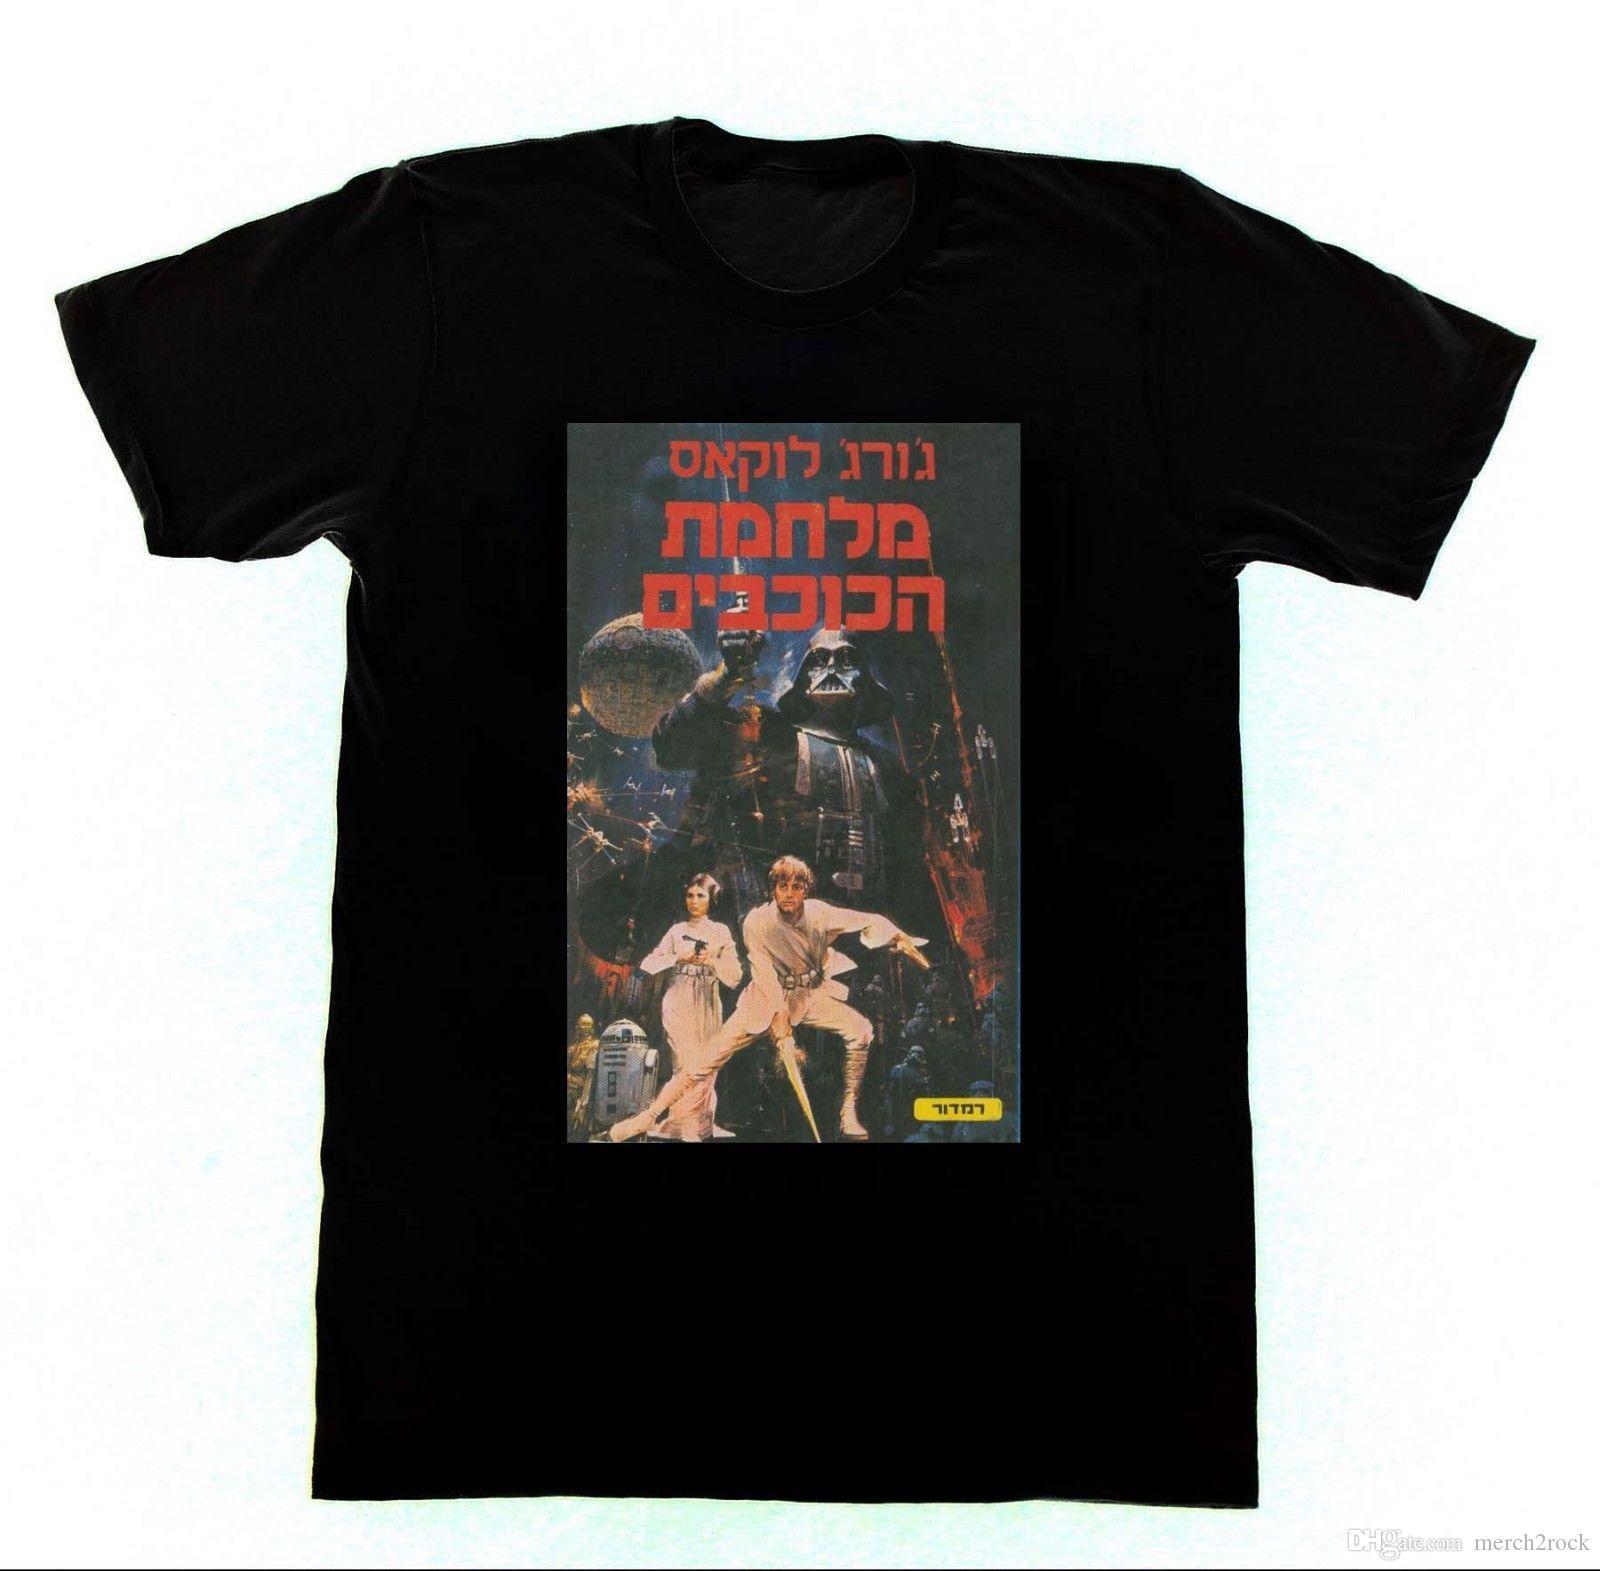 7ddf696a Top Tee Hebrew TShirt 142 Shirt Israel Import Poster Jewish Geek T Shirts  Mens Formal Shirts From Merch2rock, $10.95| DHgate.Com